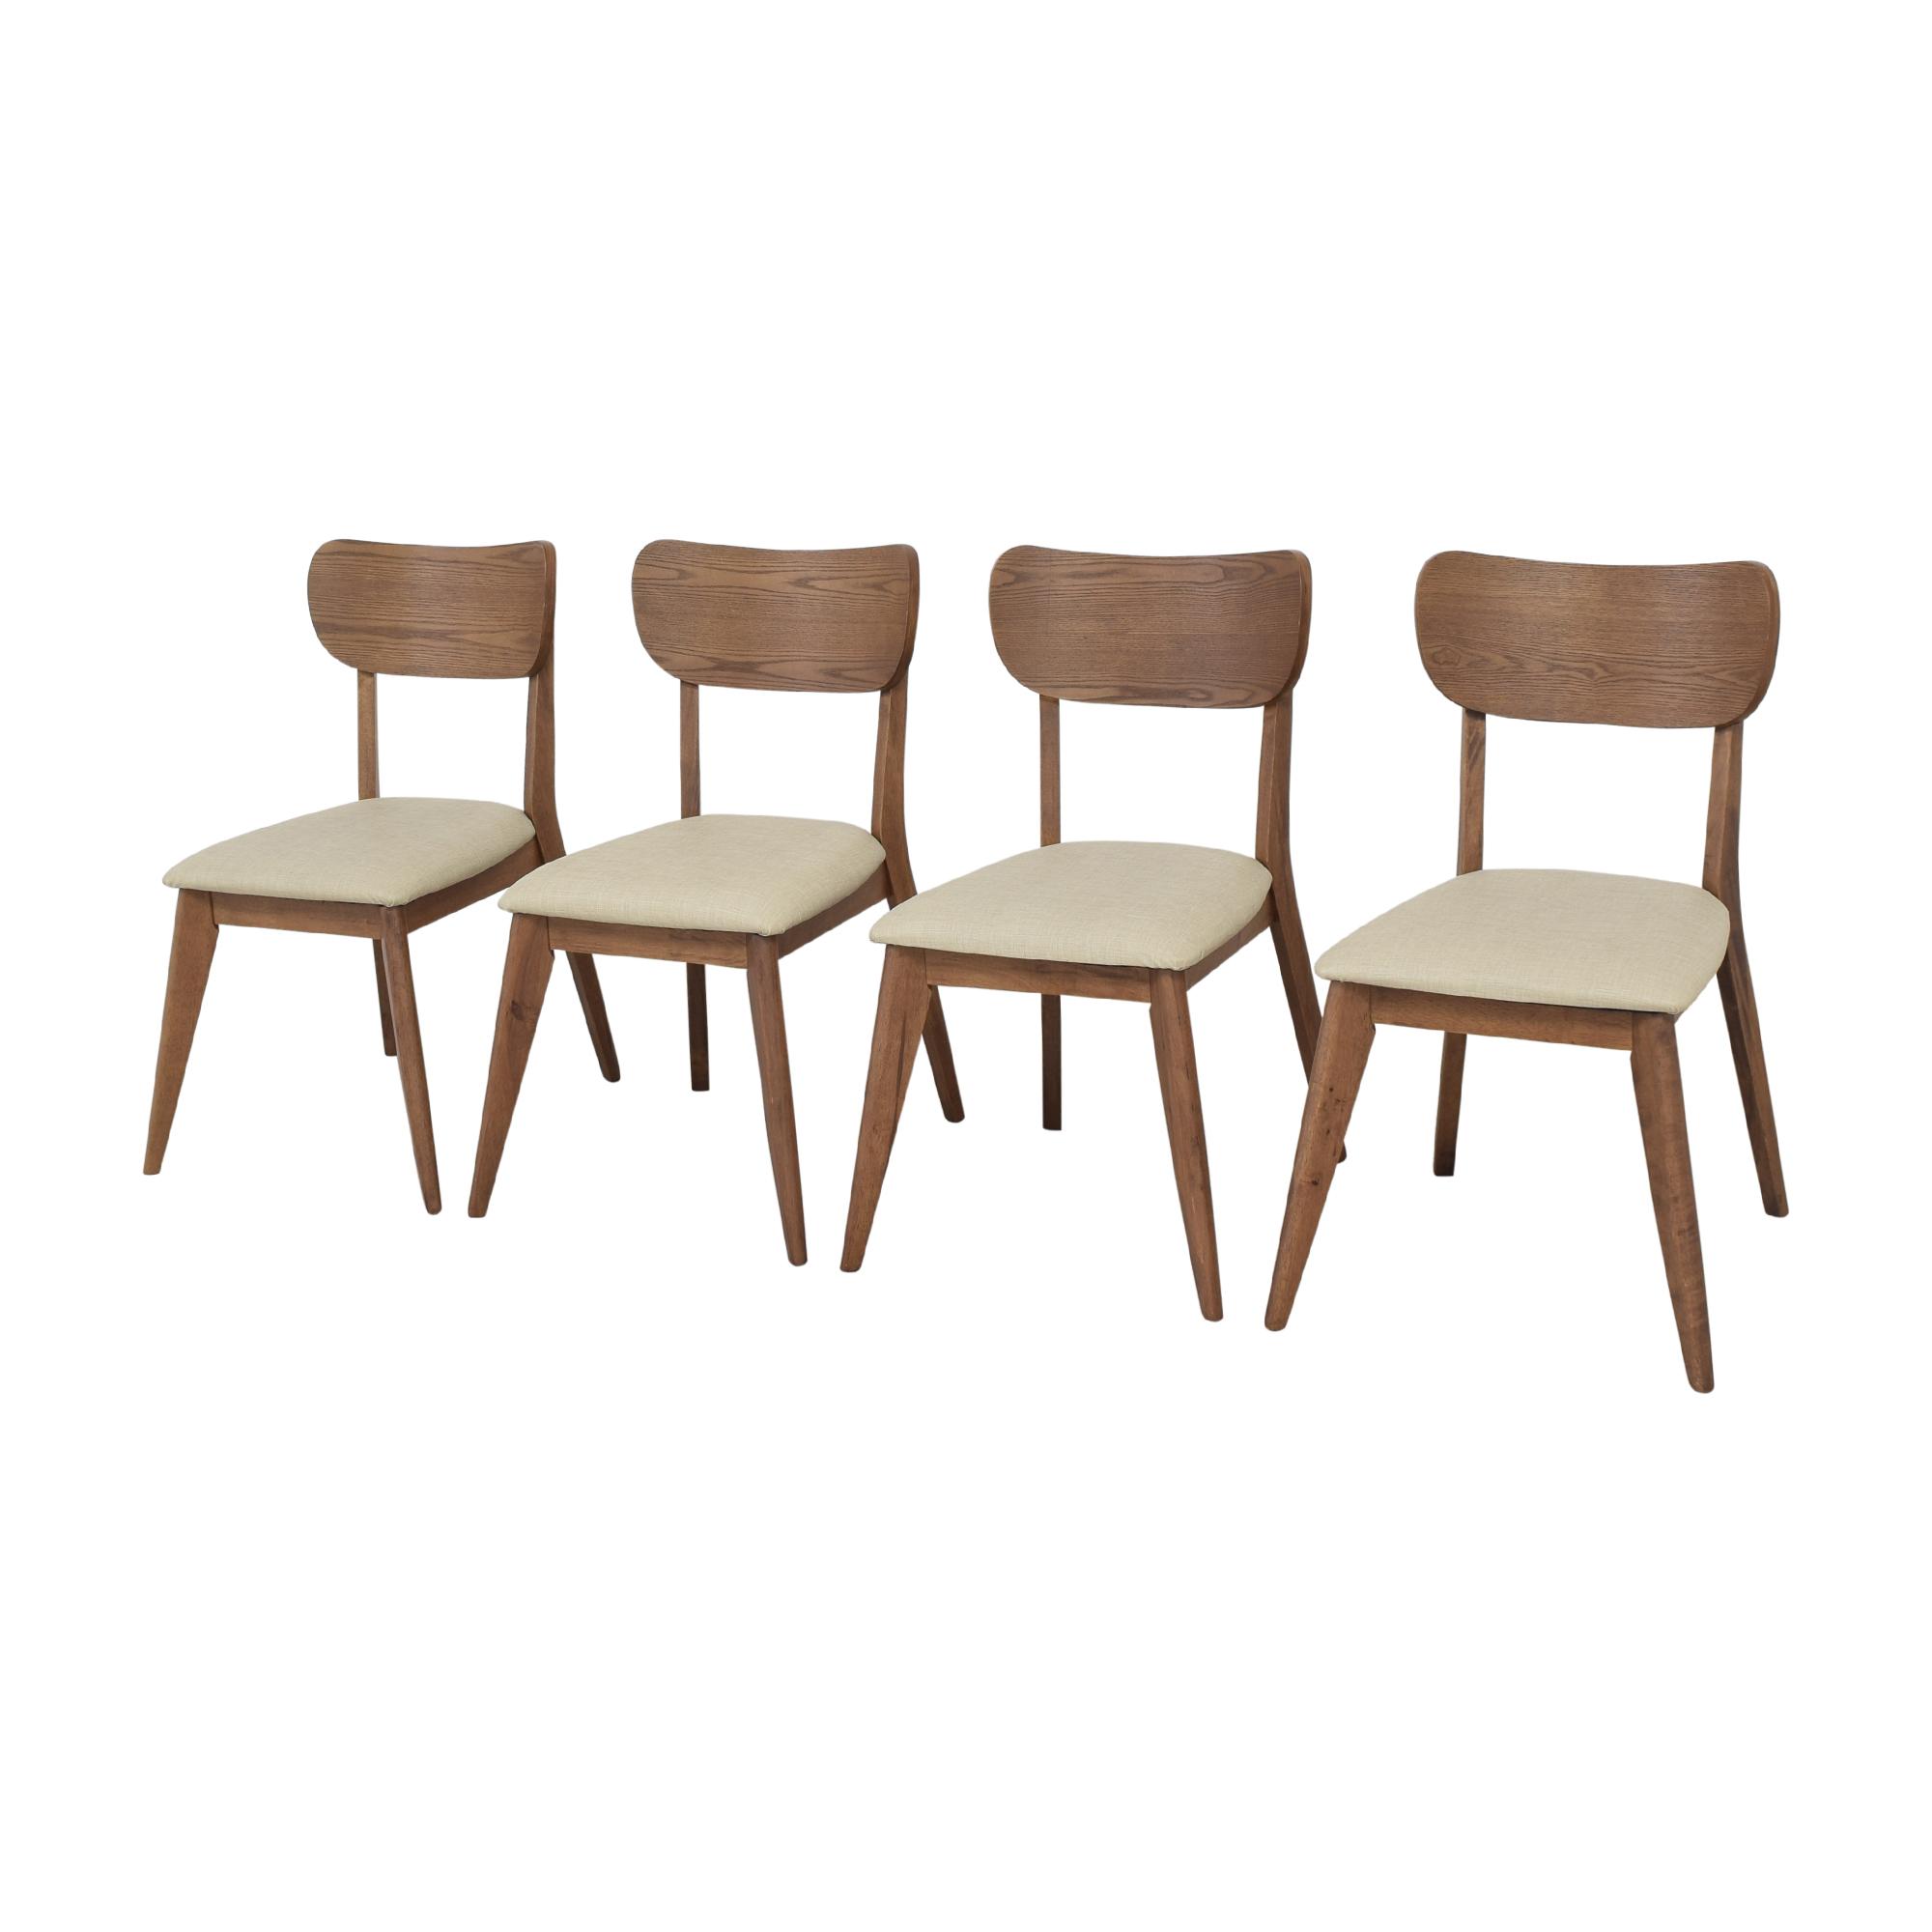 AllModern Mid-Century Modern Style Dining Chairs sale